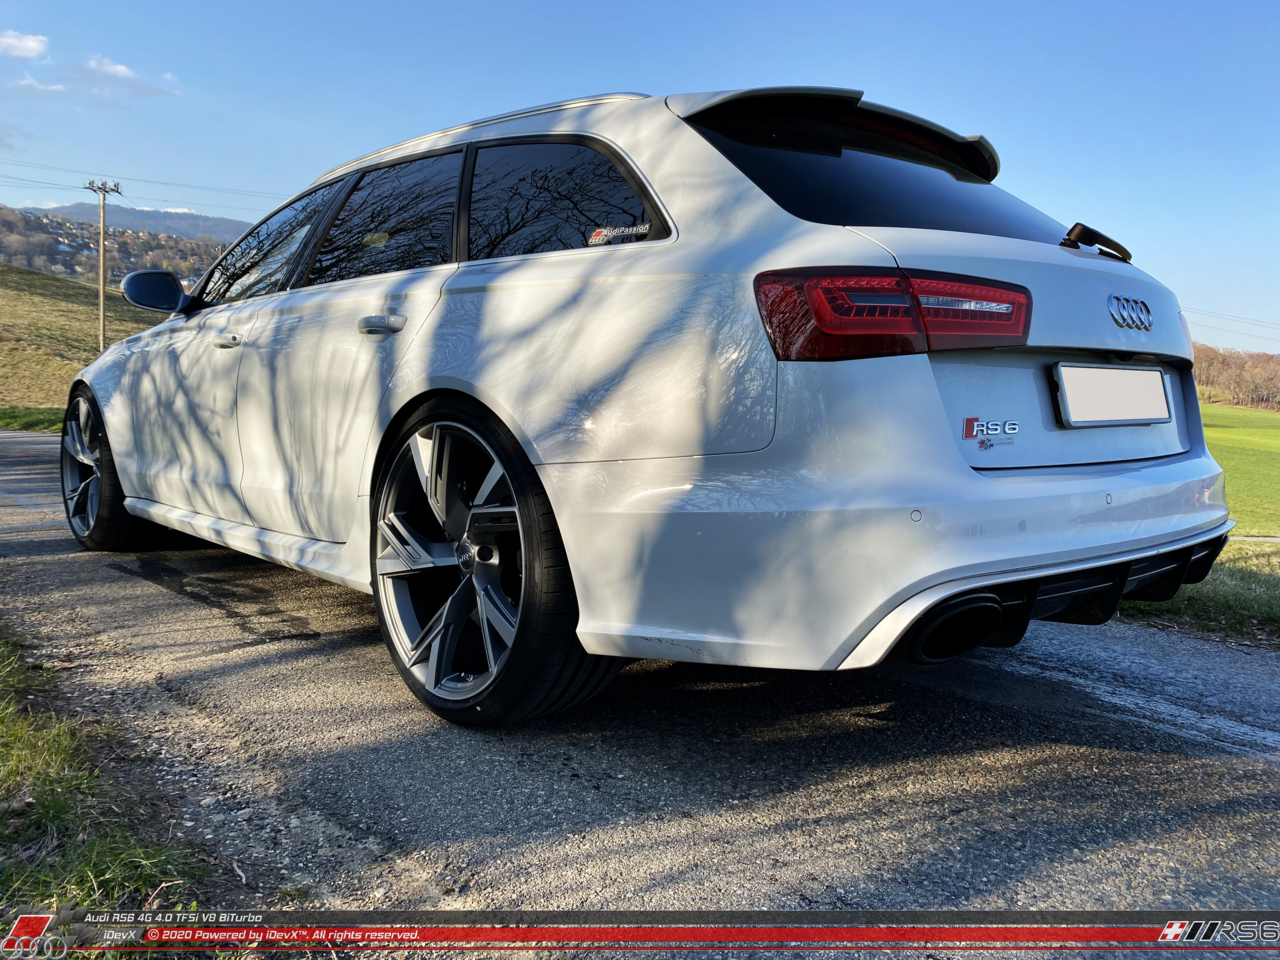 18.03.2020_Audi-RS6_iDevX_010.png